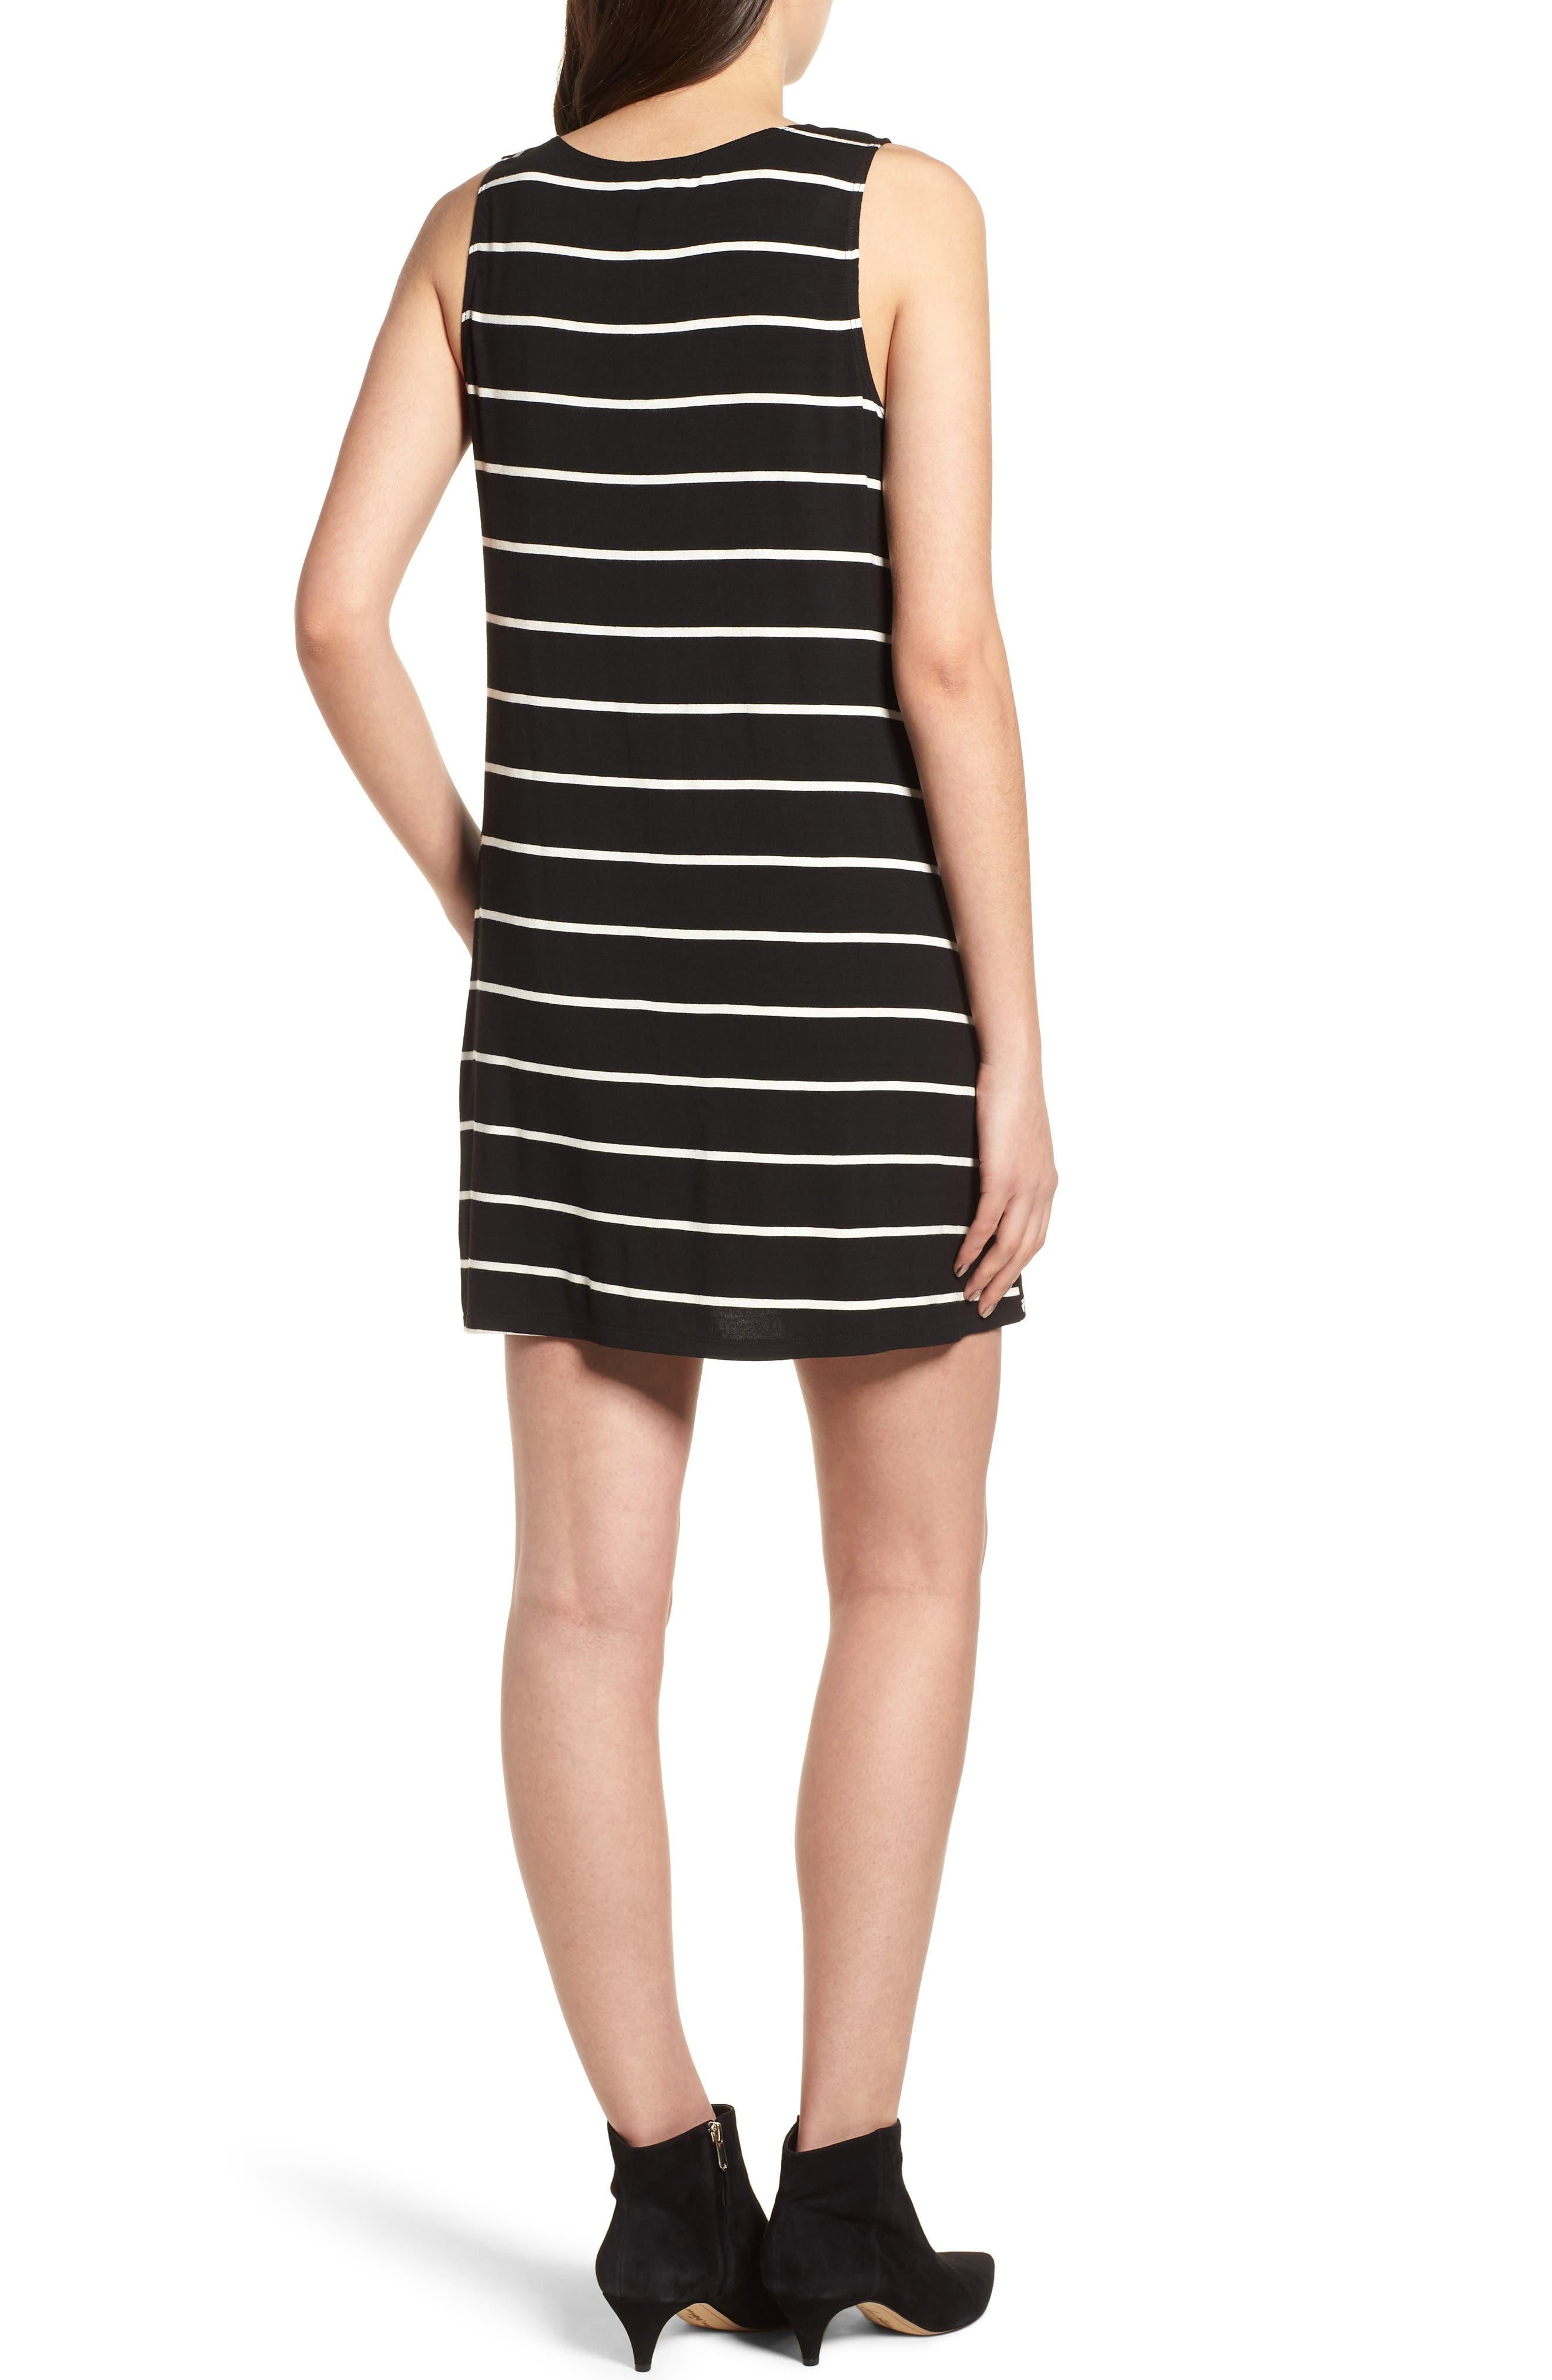 Pocket Tank Dress,                             Alternate thumbnail 2, color,                             BLACK/ WHITE STRIPE